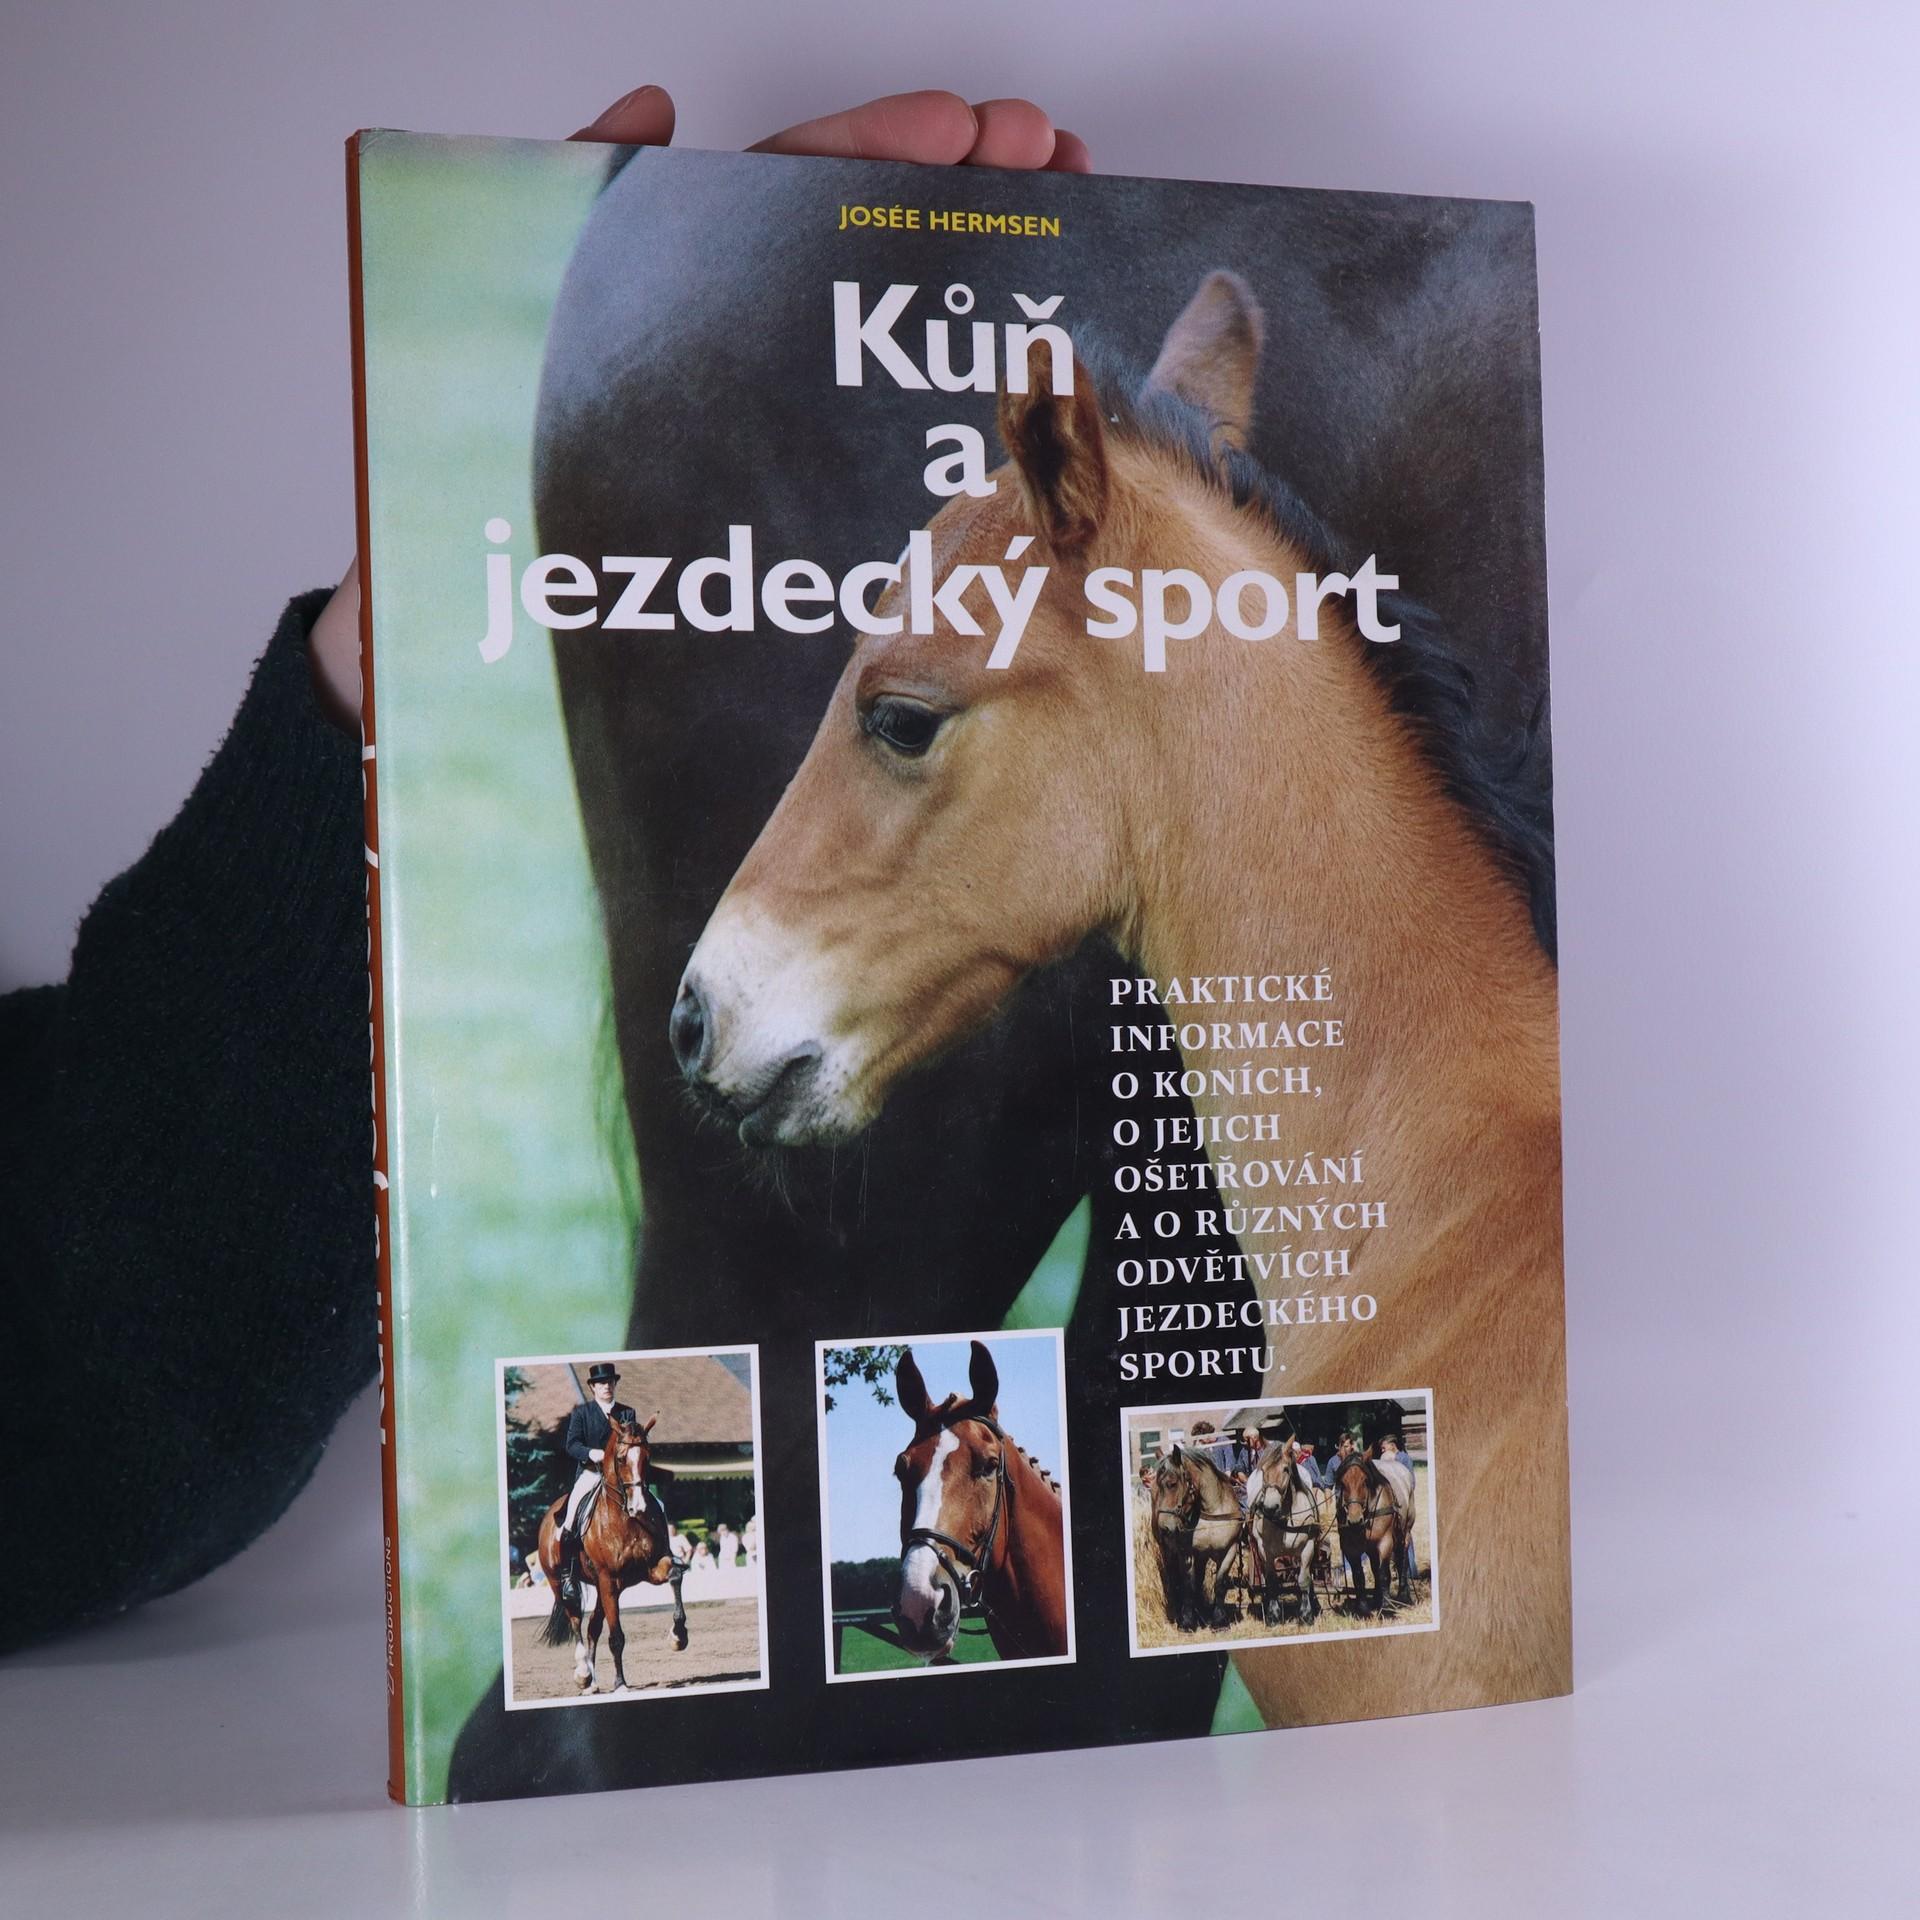 antikvární kniha Kůň a jezdecký sport, neuveden